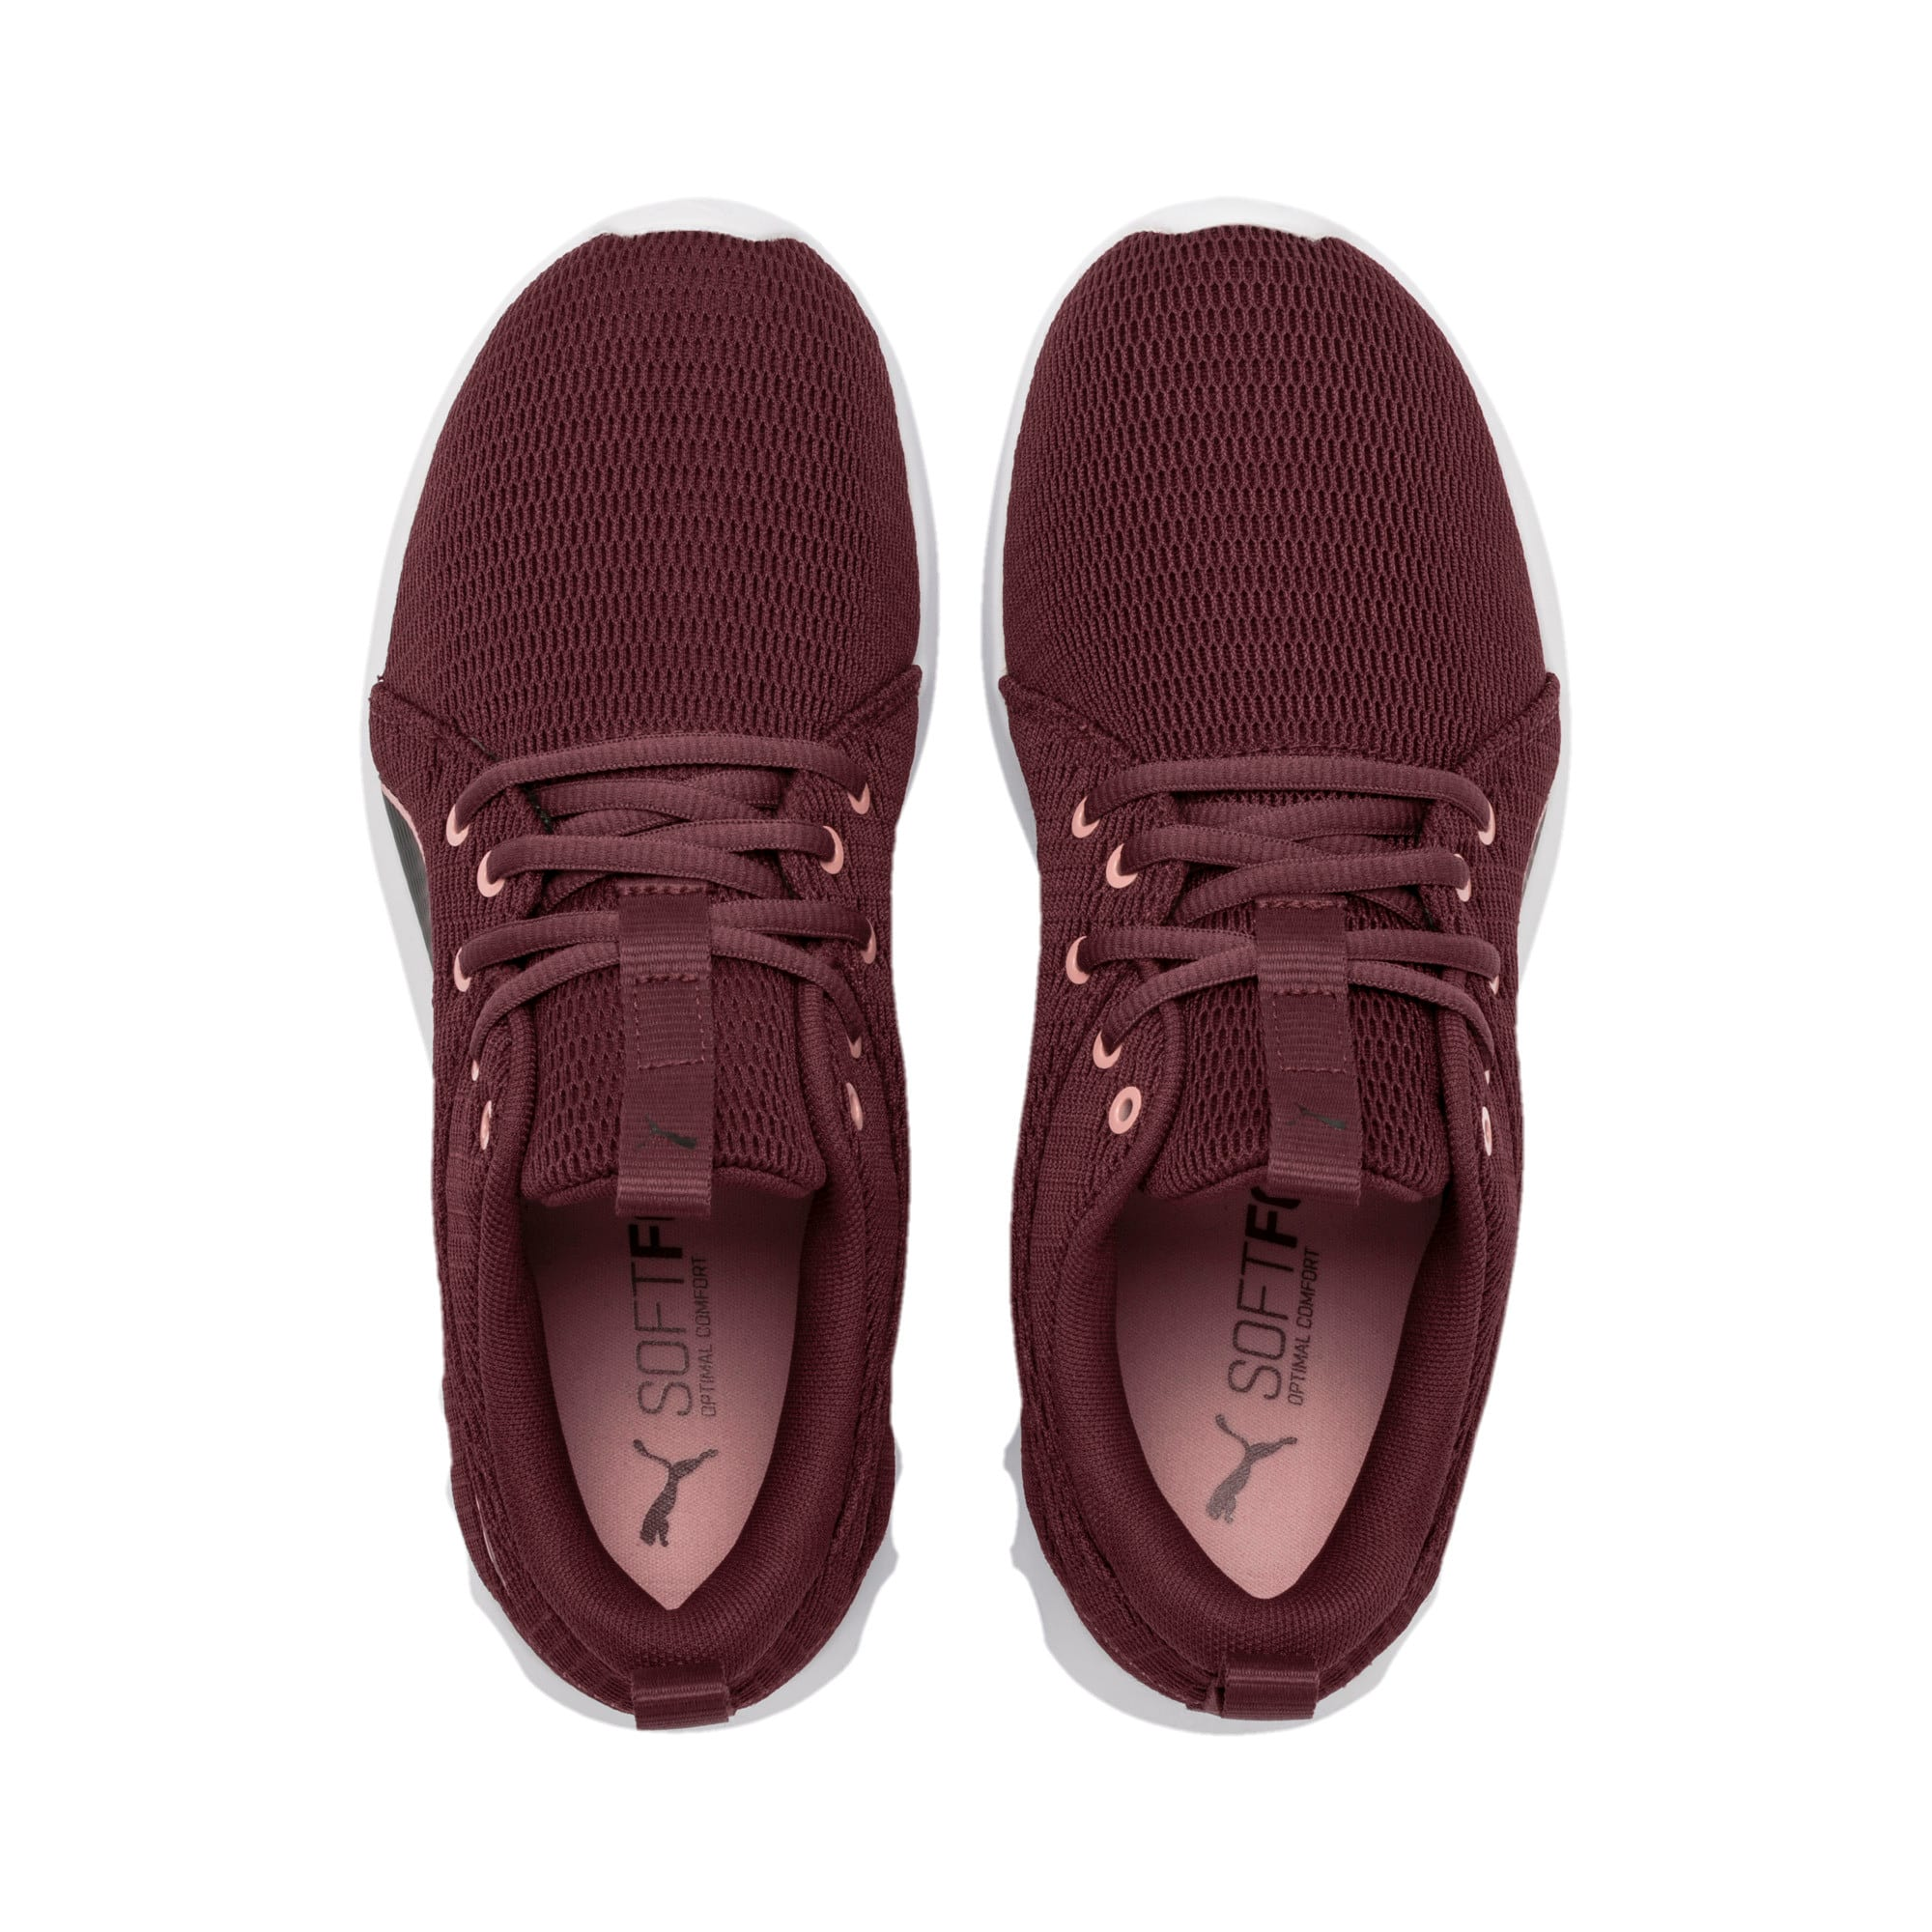 Thumbnail 7 of Carson 2 New Core Women's Training Shoes, Vineyard Wine-Black-Rose, medium